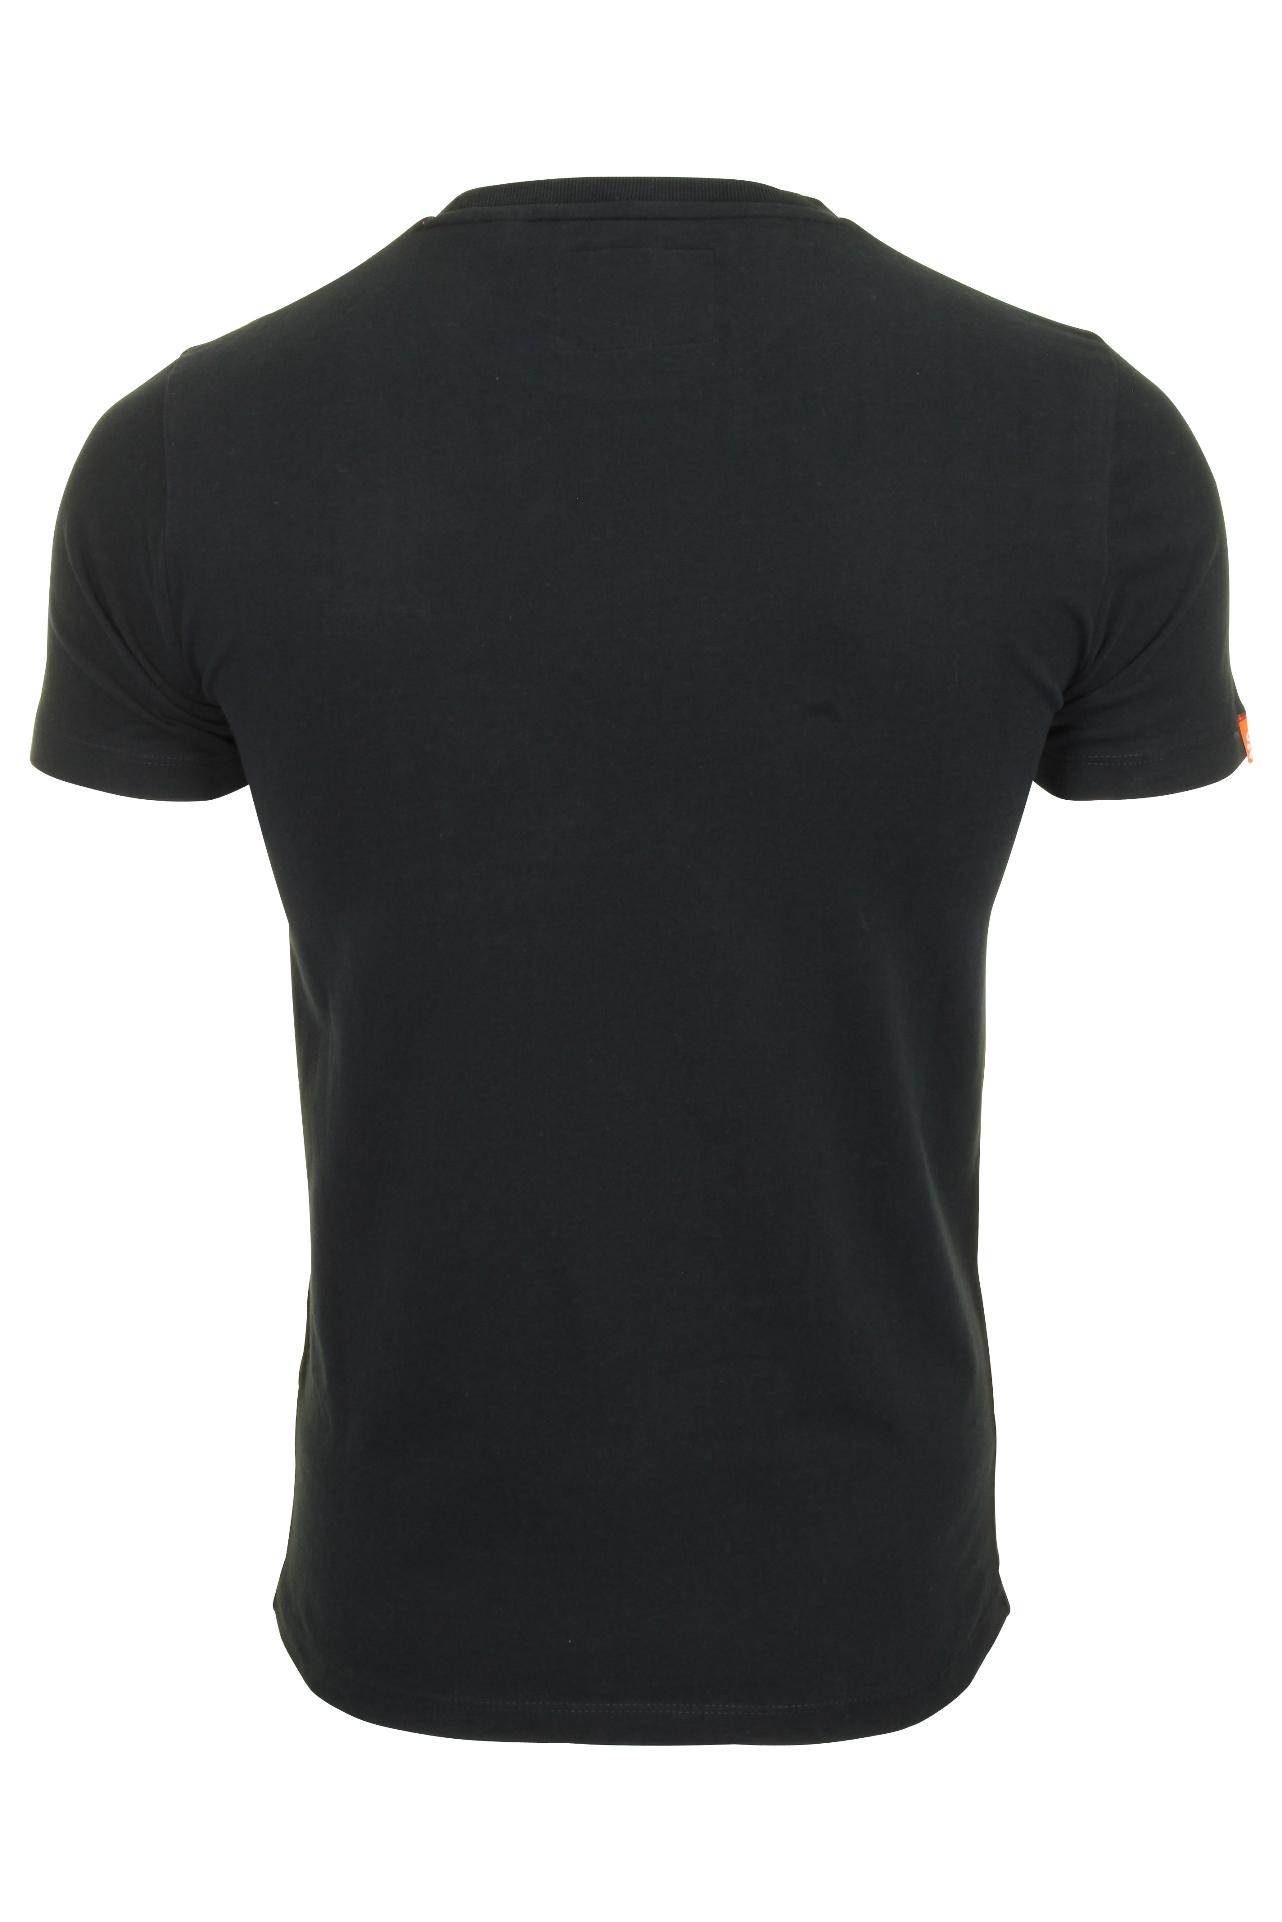 Top-Superdry-Orange-Label-Da-Uomo-039-Vintage-039-T-shirt-girocollo miniatura 8